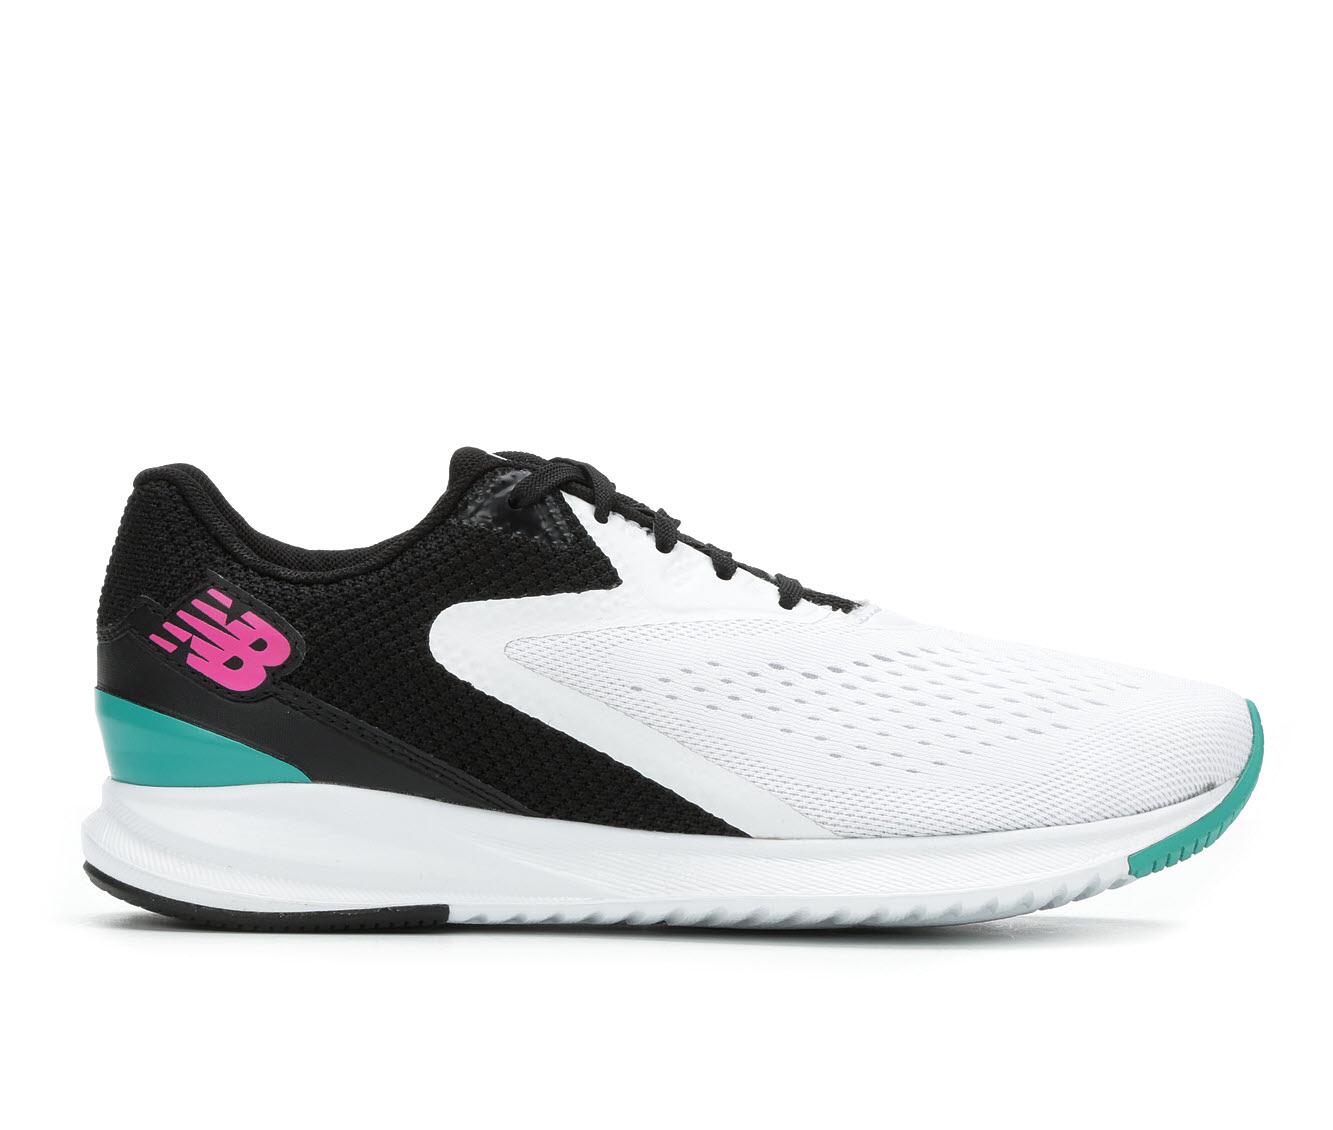 New Balance Vizo Pro Run Women's Athletic Shoe (White)